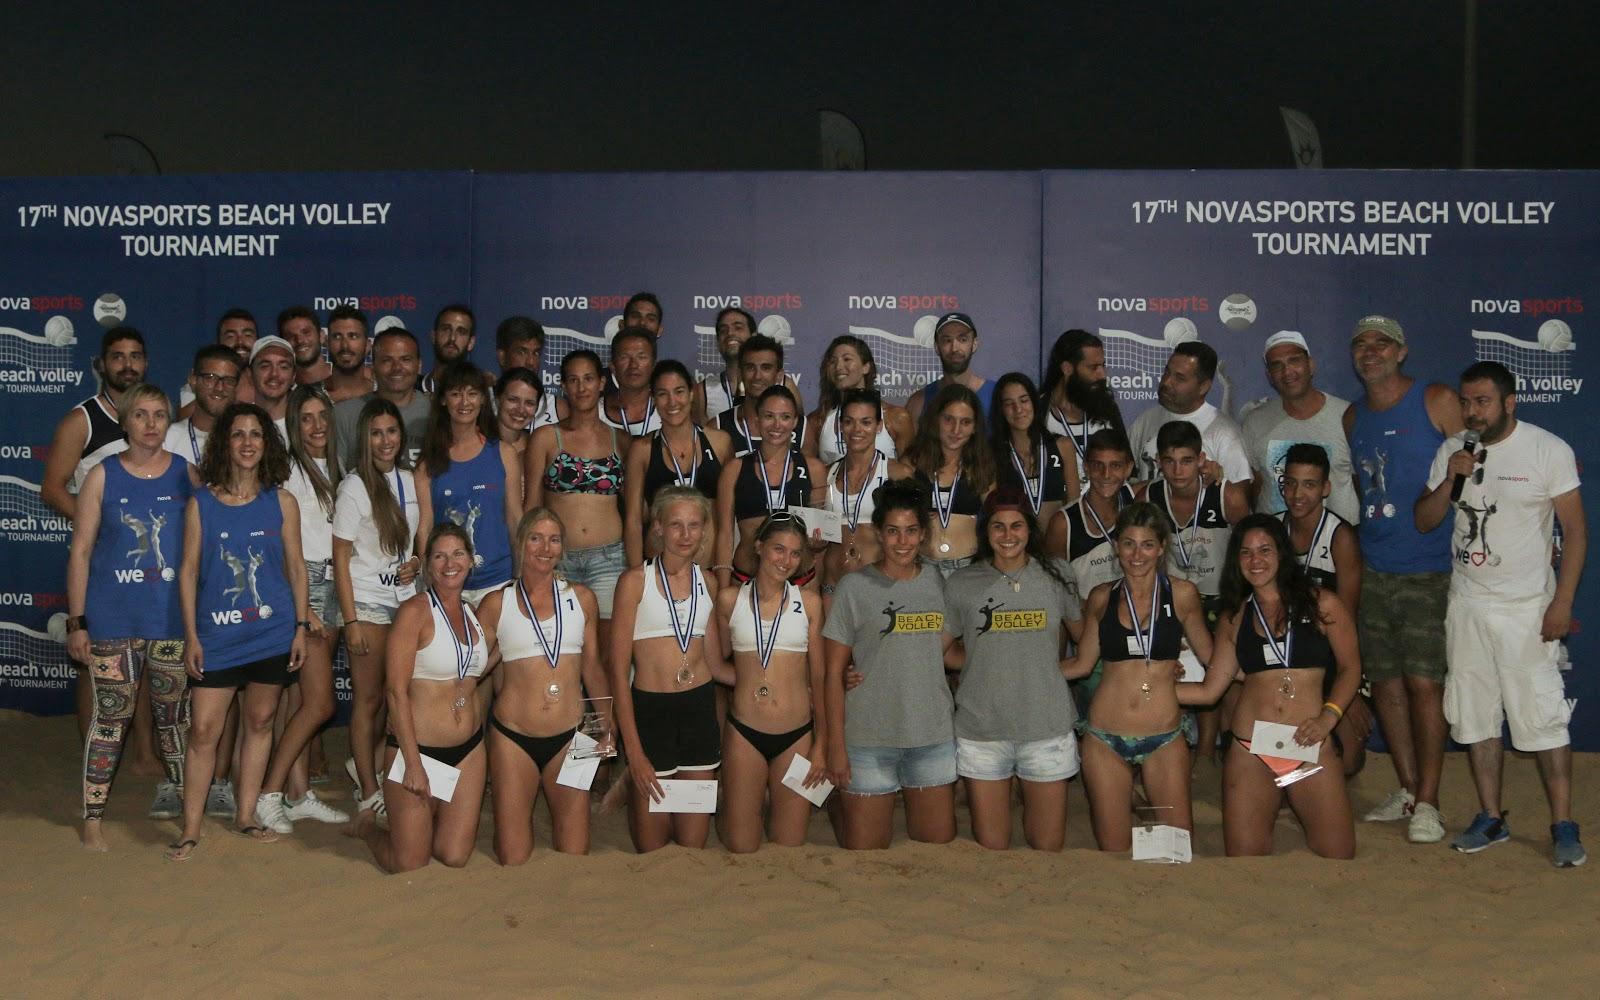 17th Novasports Beach Volley Tournament 2016